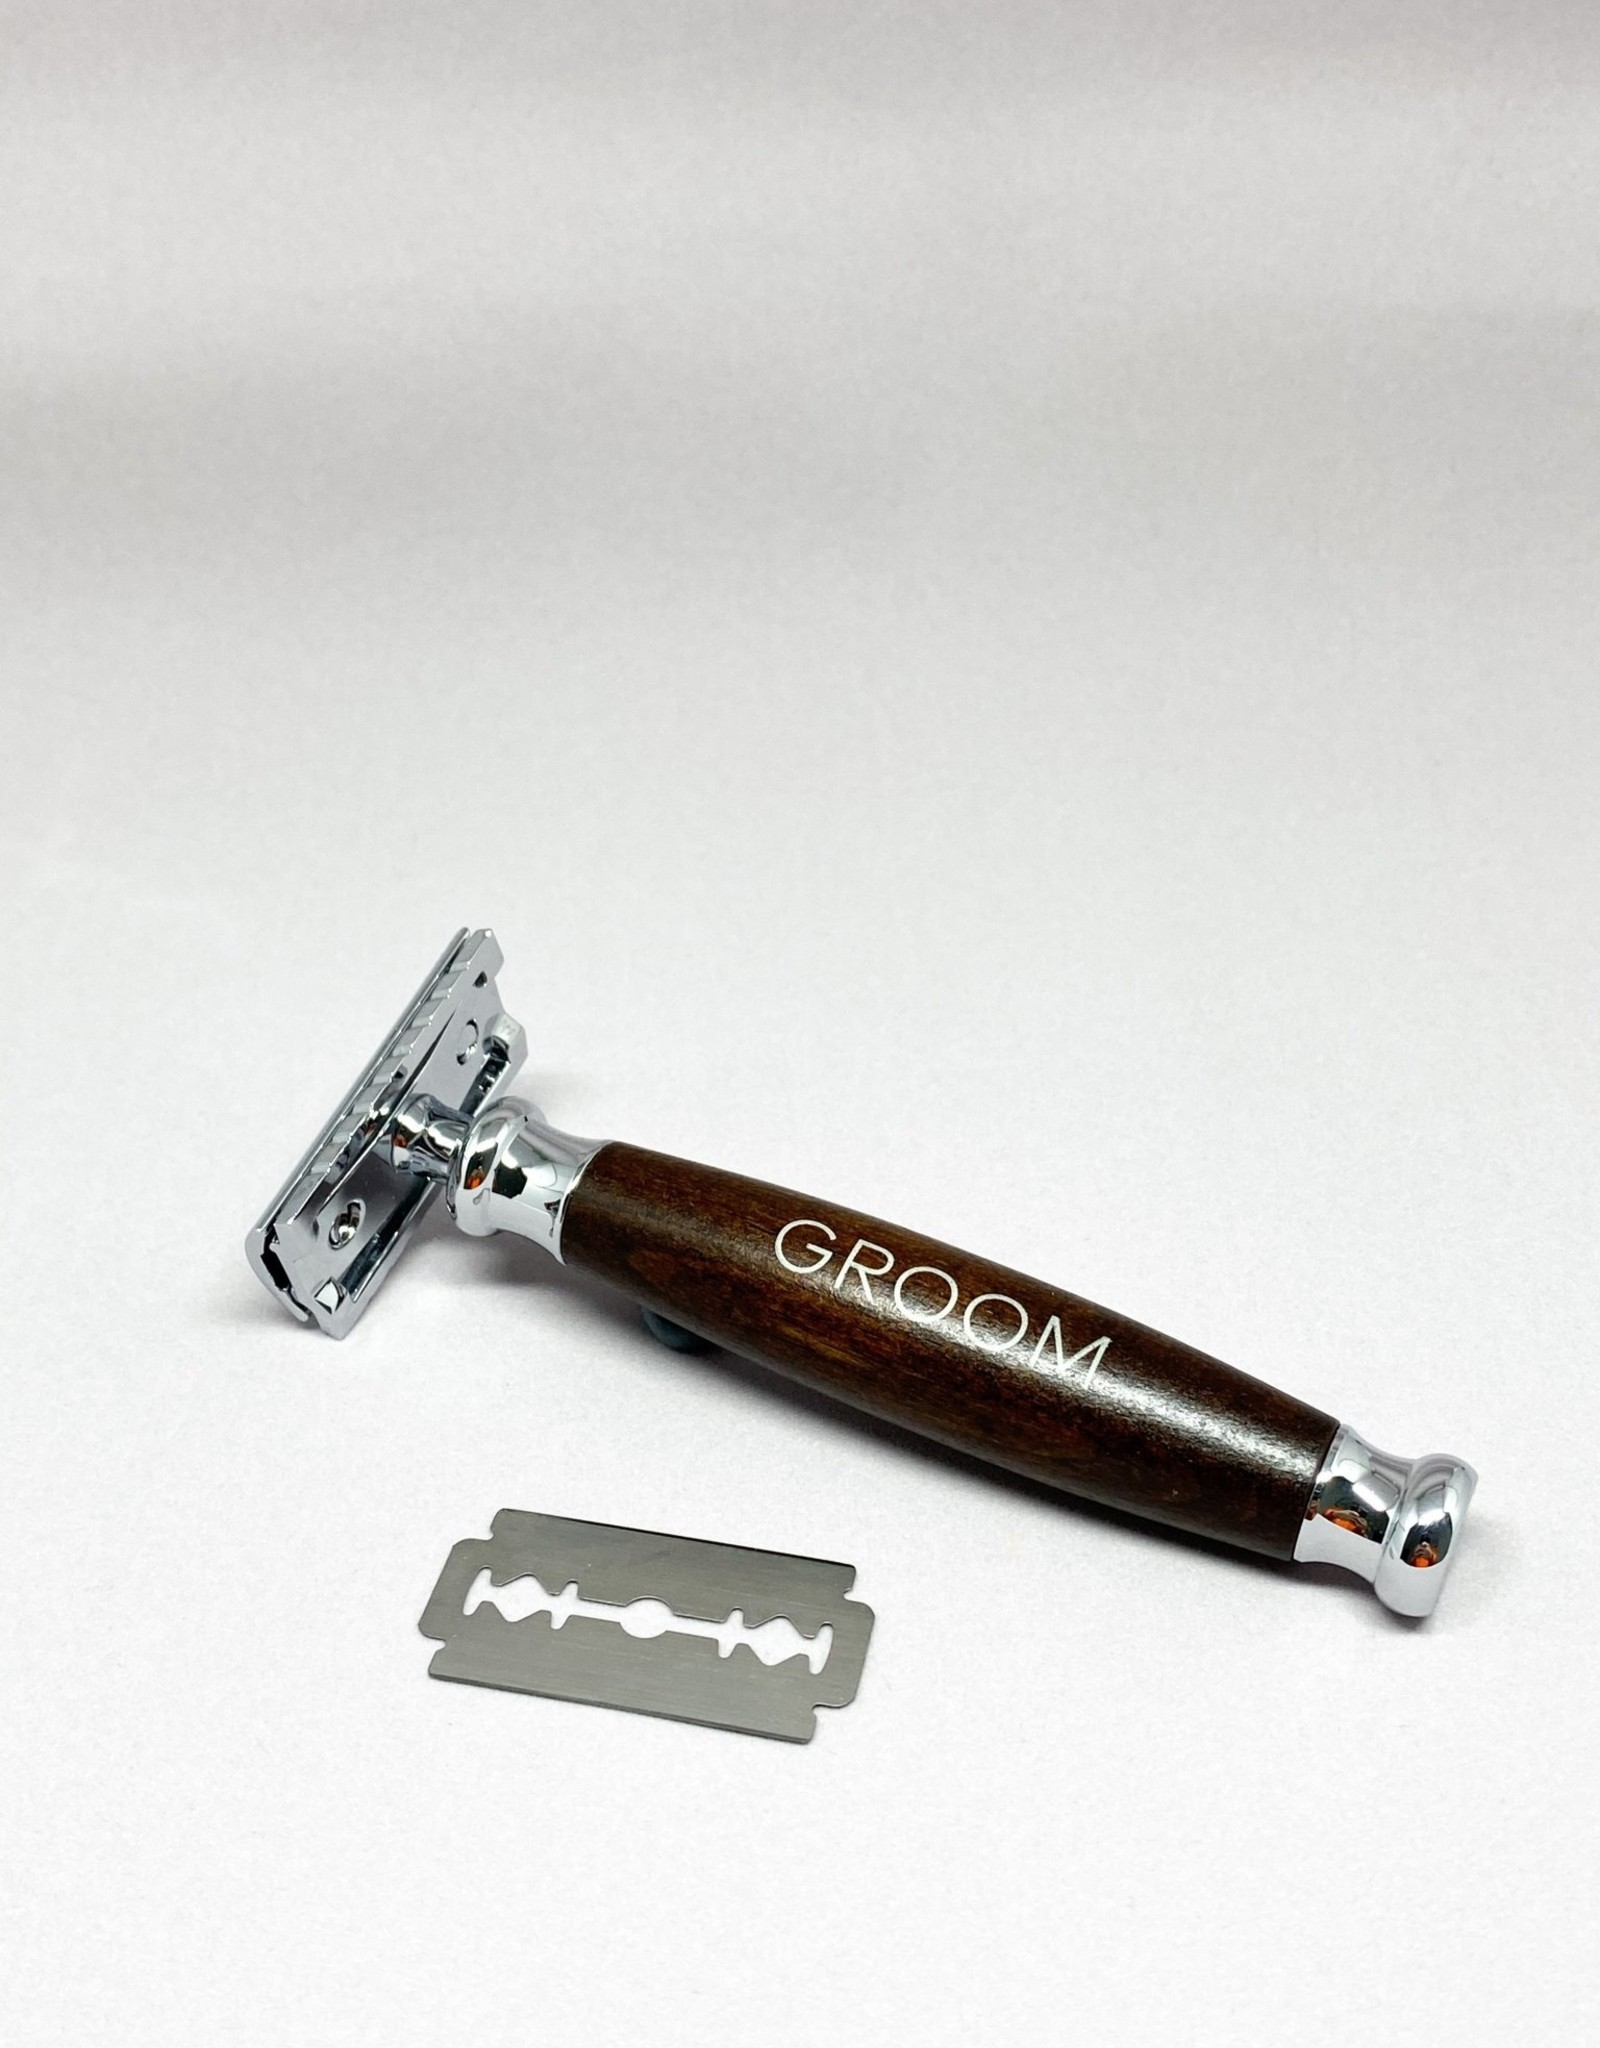 Groom - Rasoir de sûreté